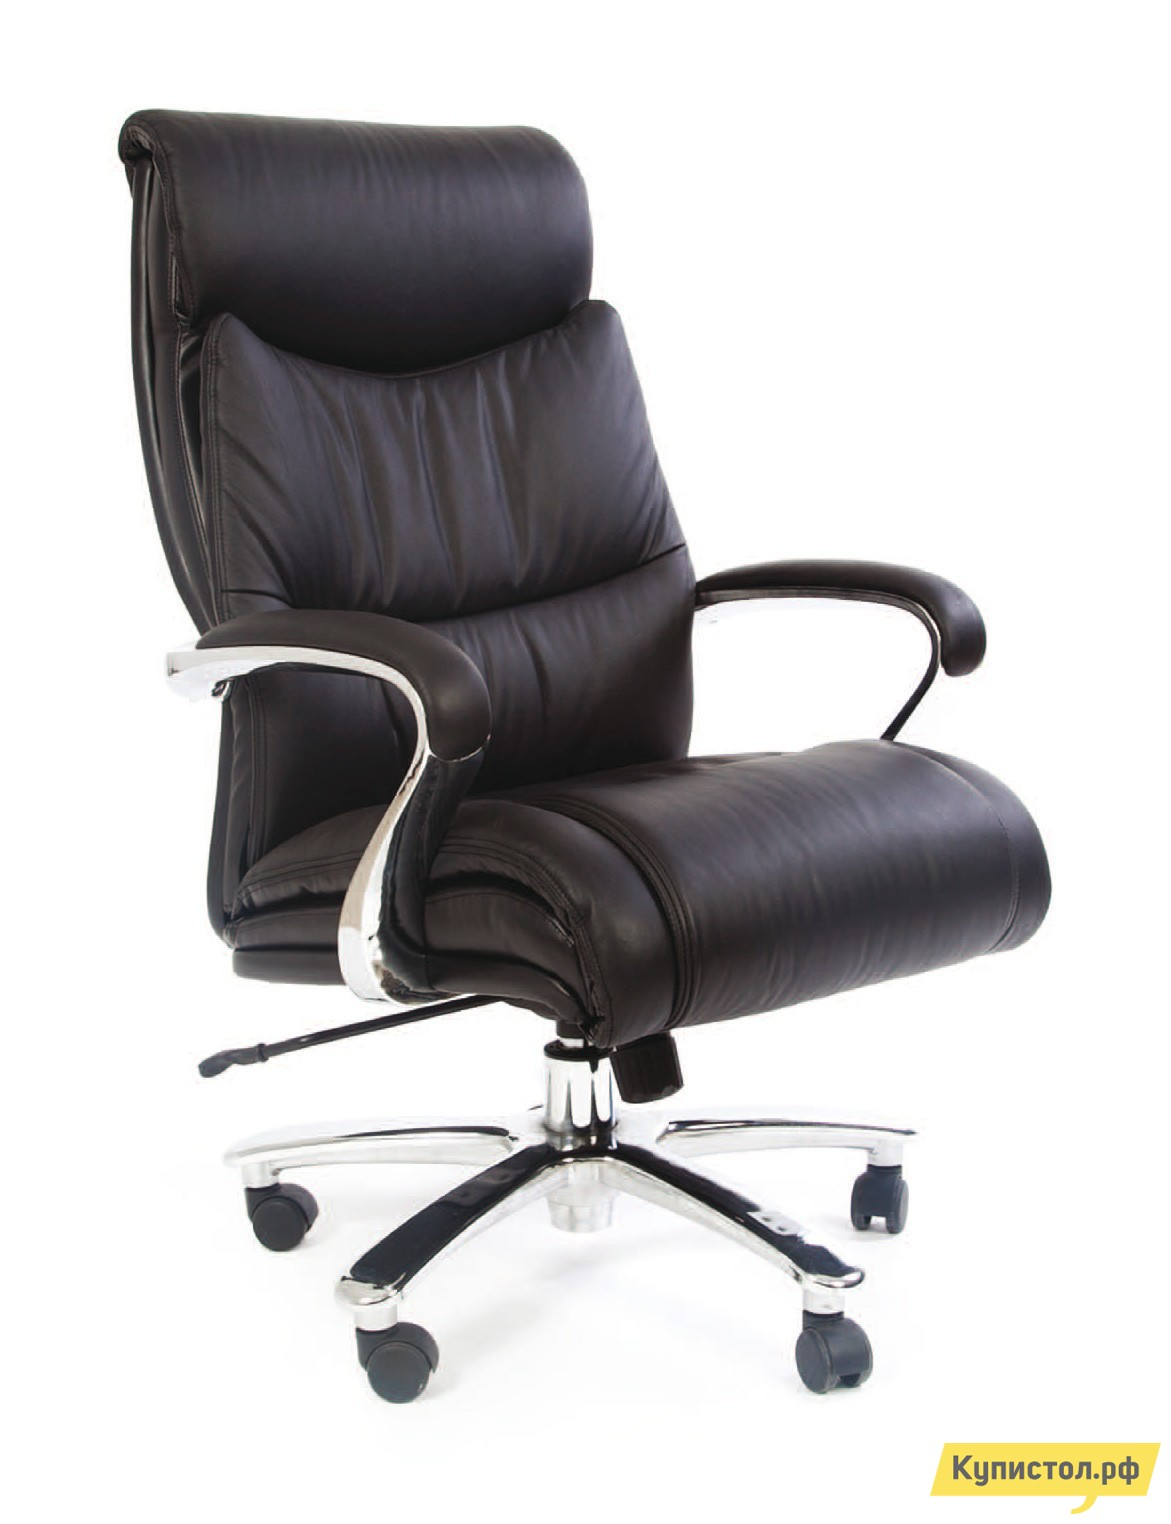 Кресло руководителя Chairman CH 401 Черная кожа